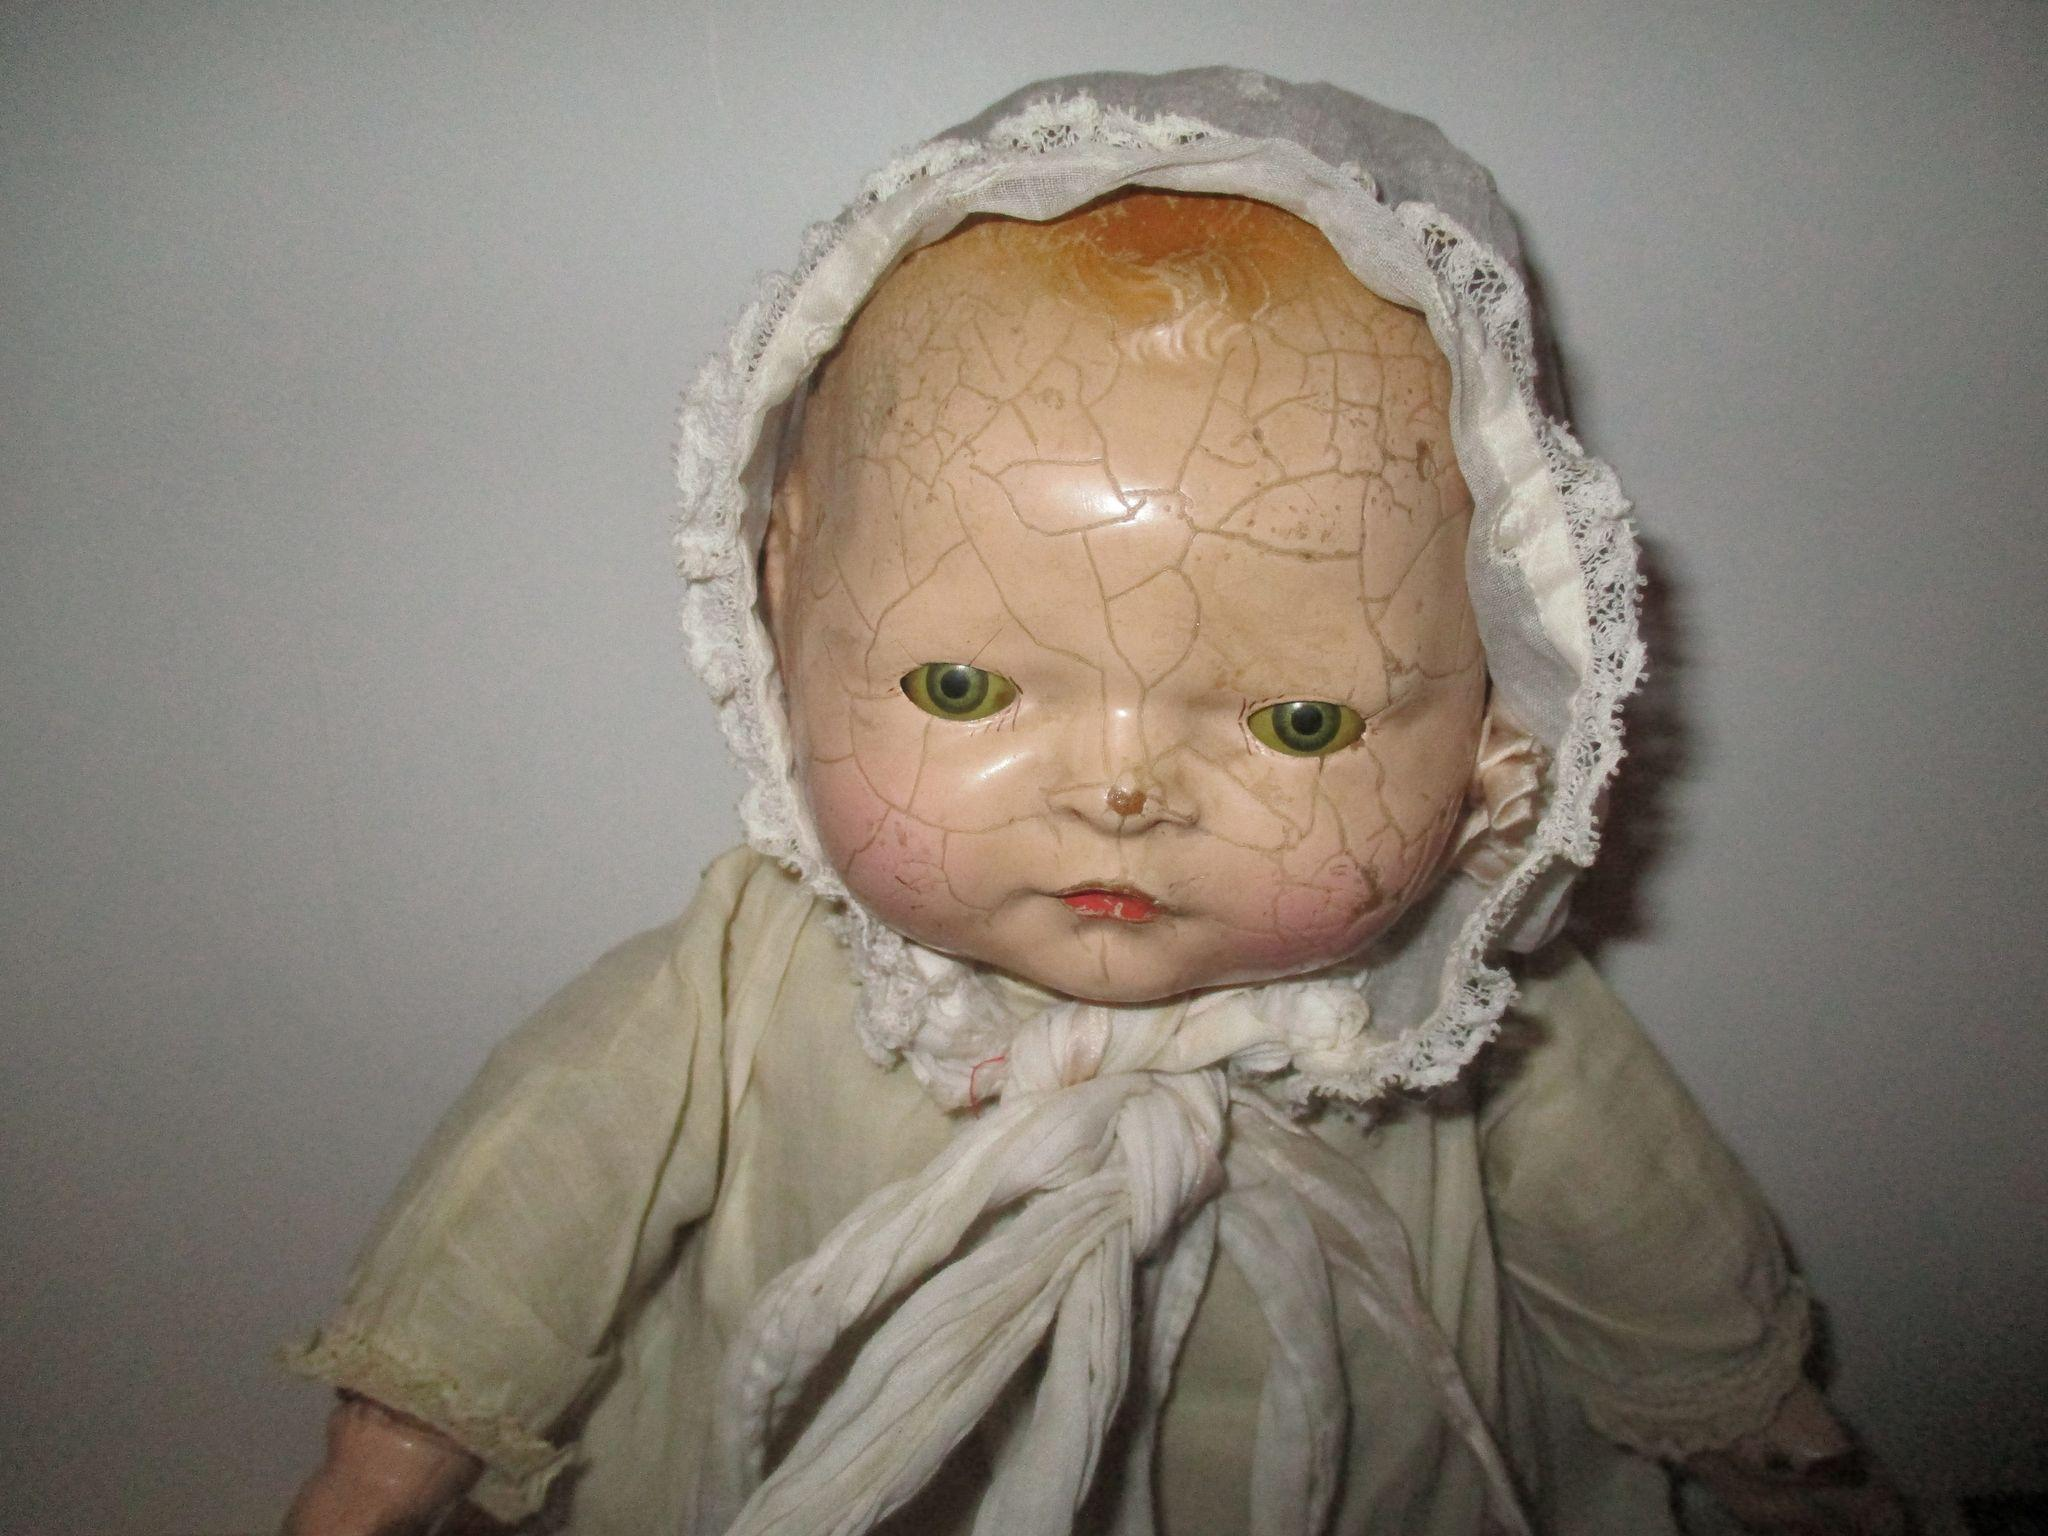 Vintage Century Baby Doll From Atticangel On Ruby Lane